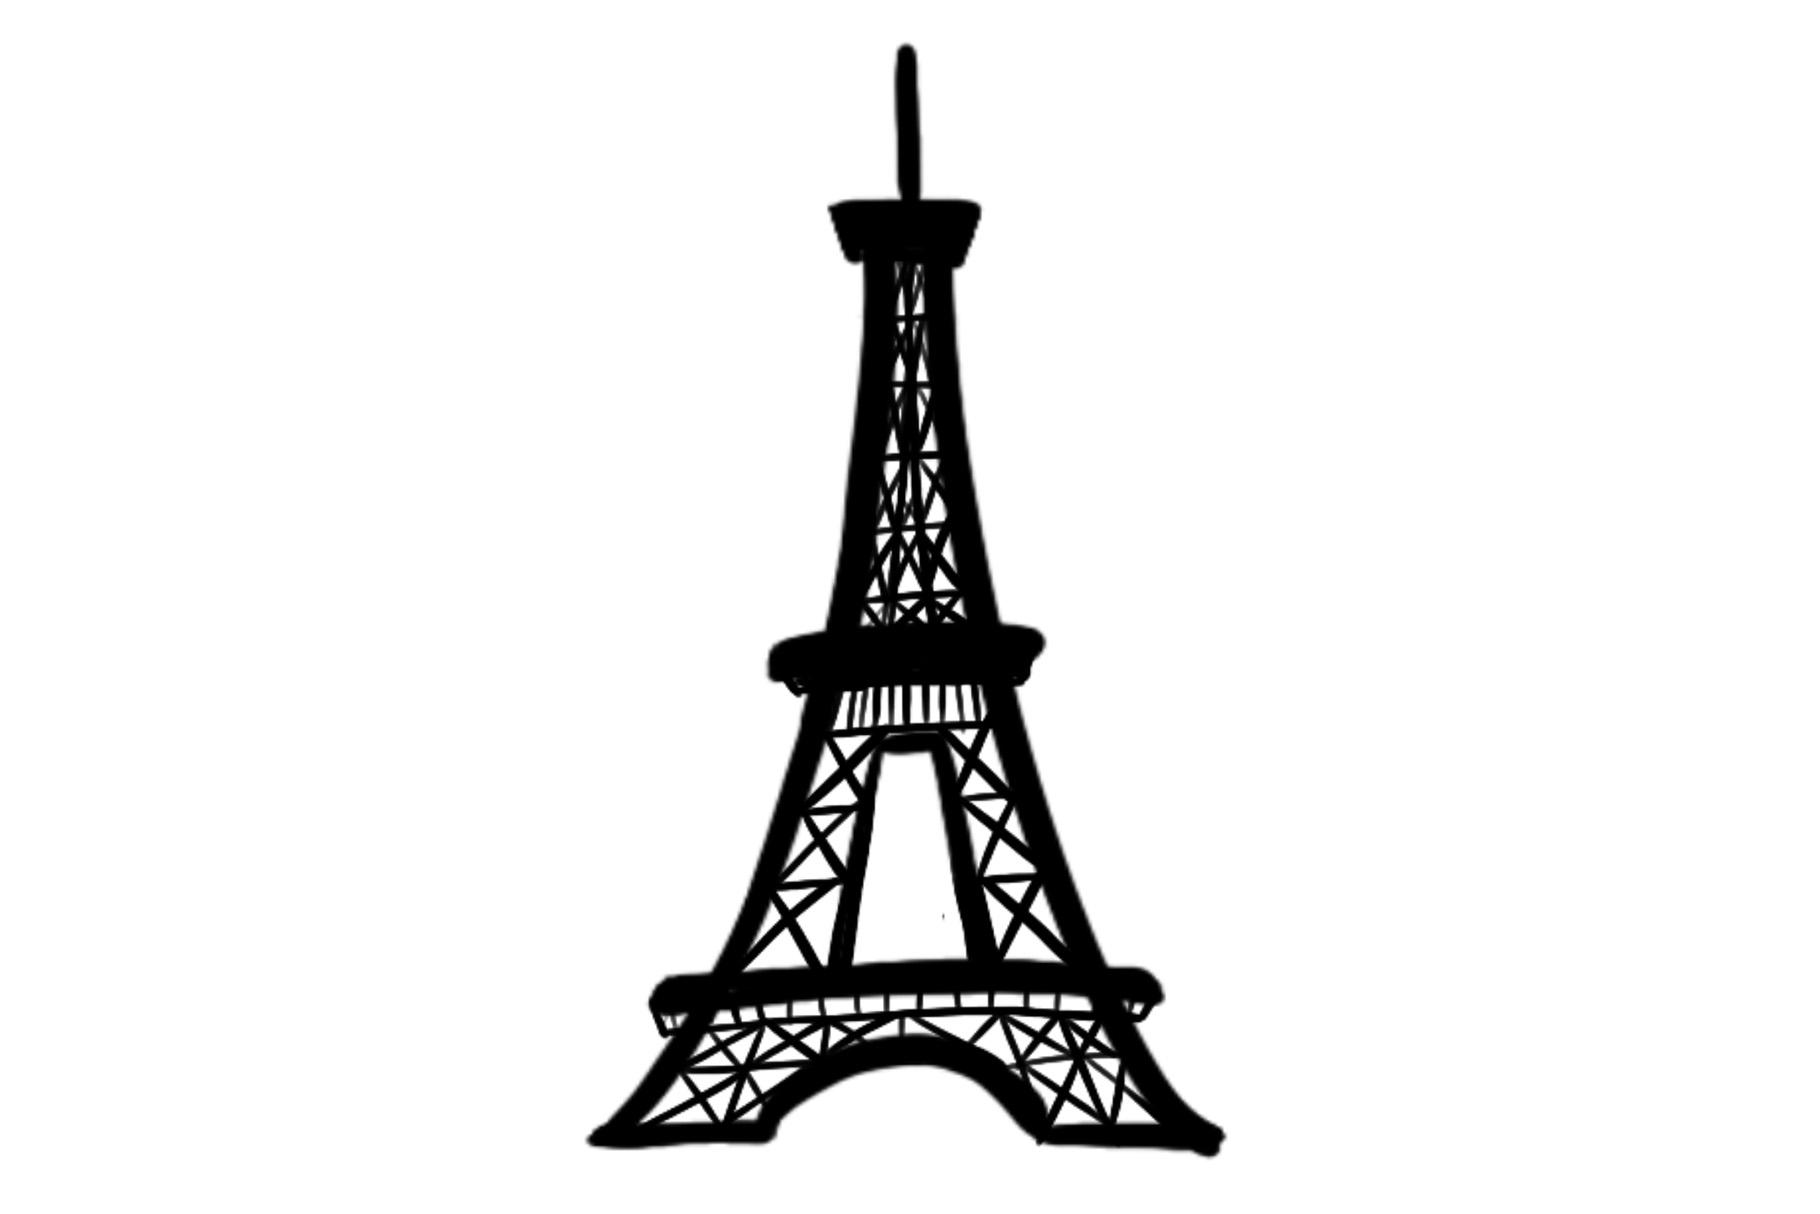 Eiffel tower silhouette clipart clipart royalty free Eiffel Tower Silhouette clipart royalty free